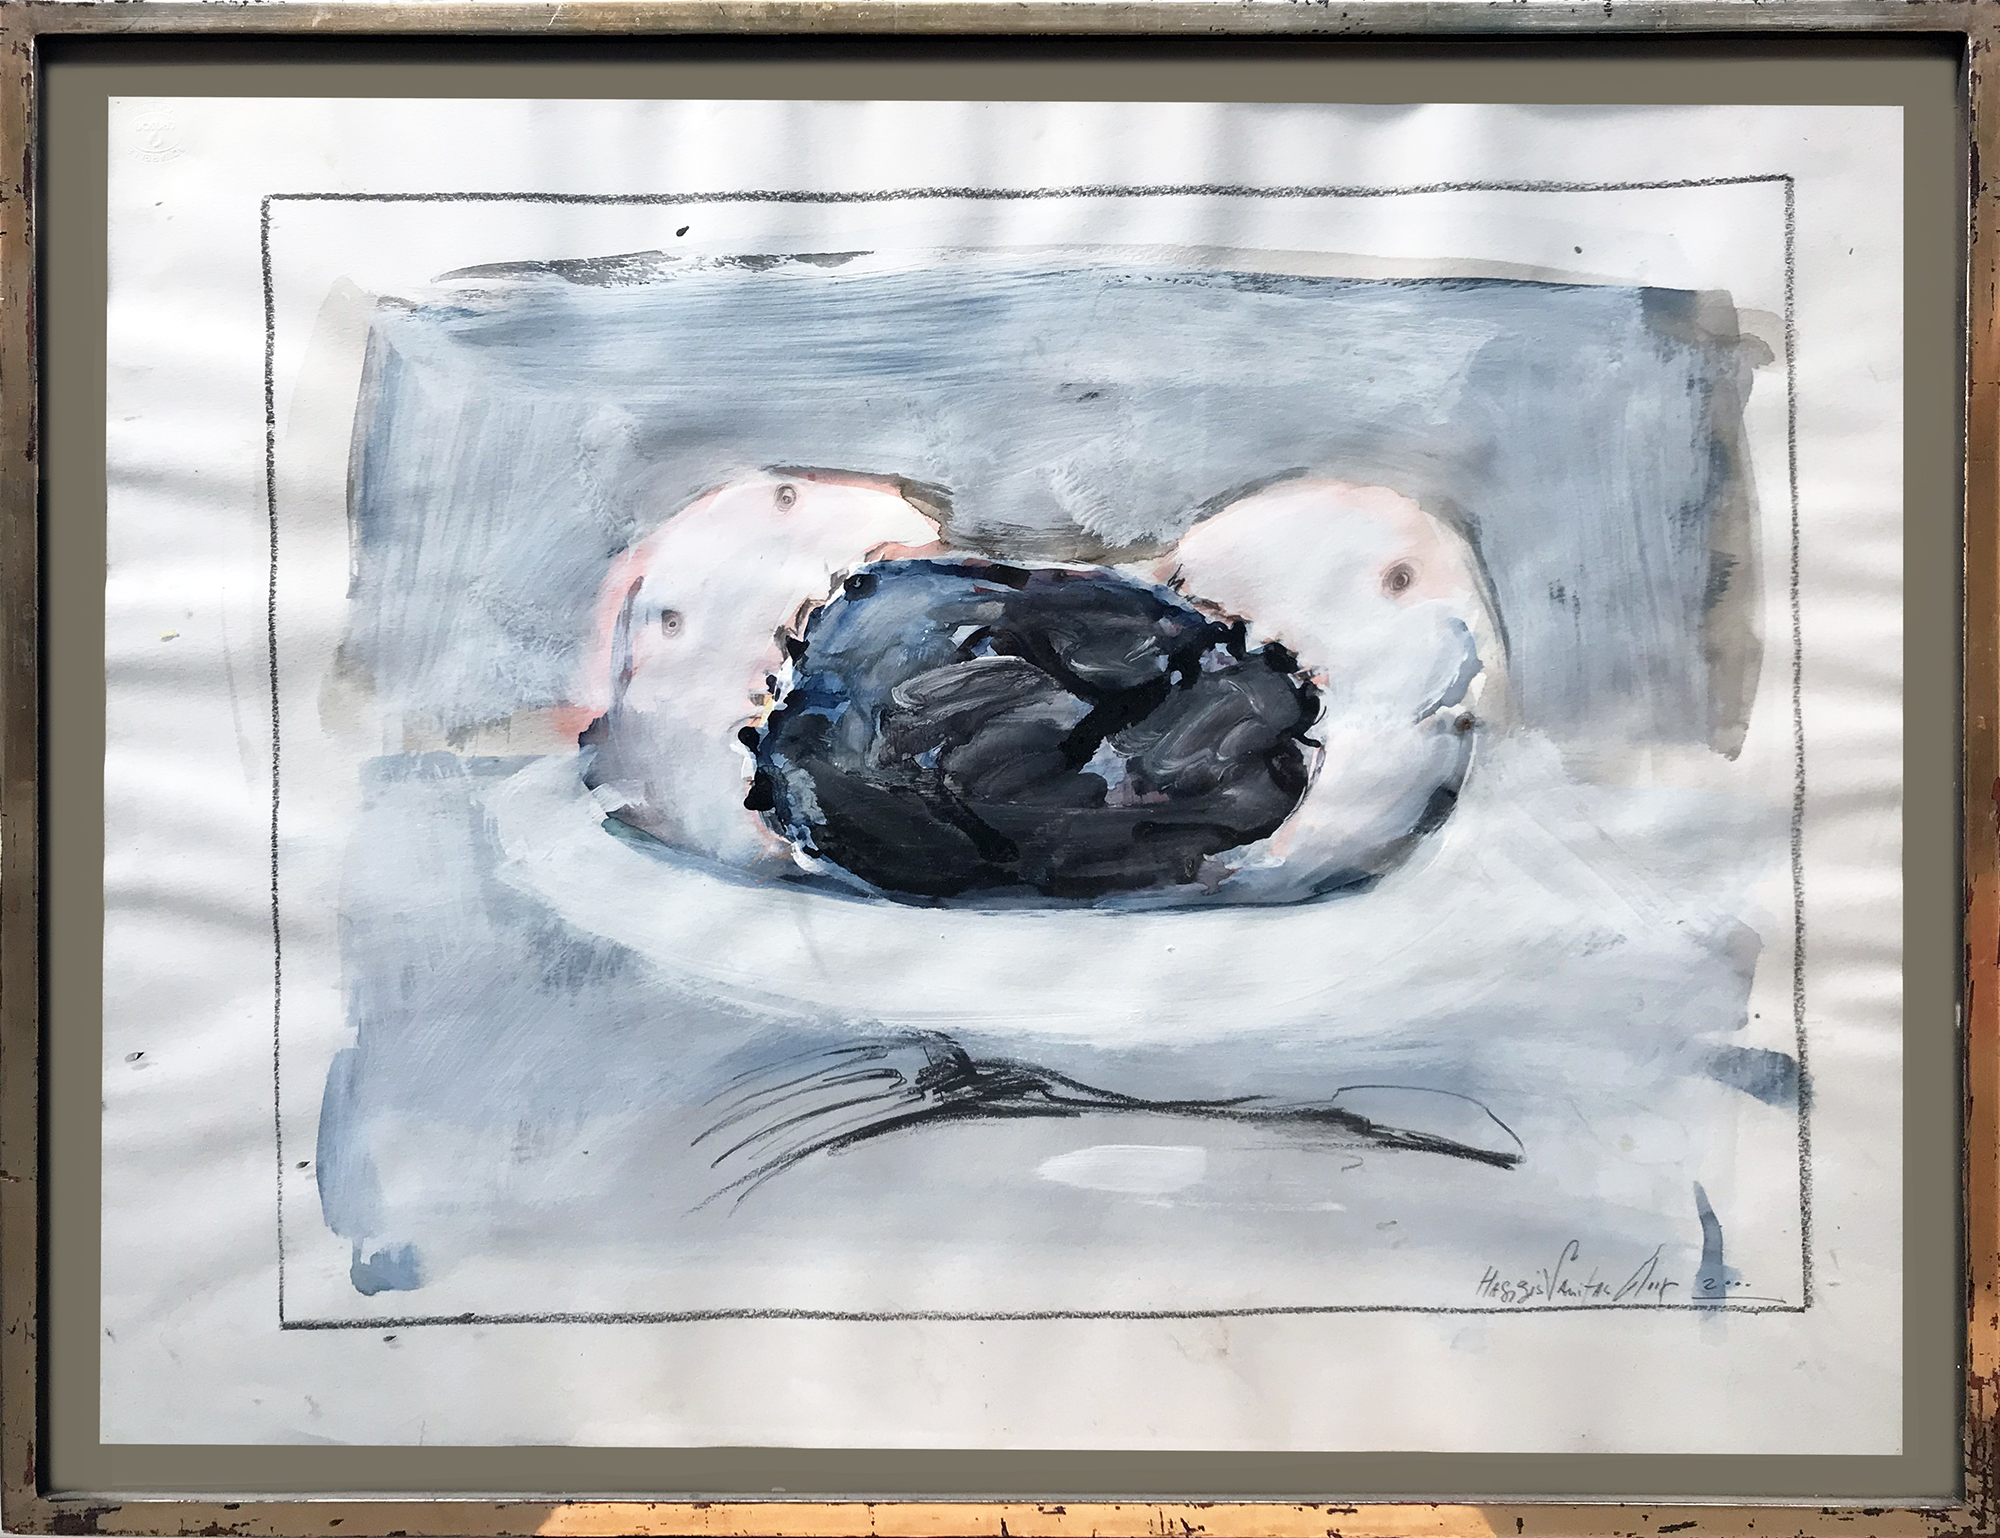 Haggis Vanitas, 2000, Mischtechnik auf Büttenpapier, 60 x 55 cm, Holzrahmen, Rahmenmass 65 x 50 cm